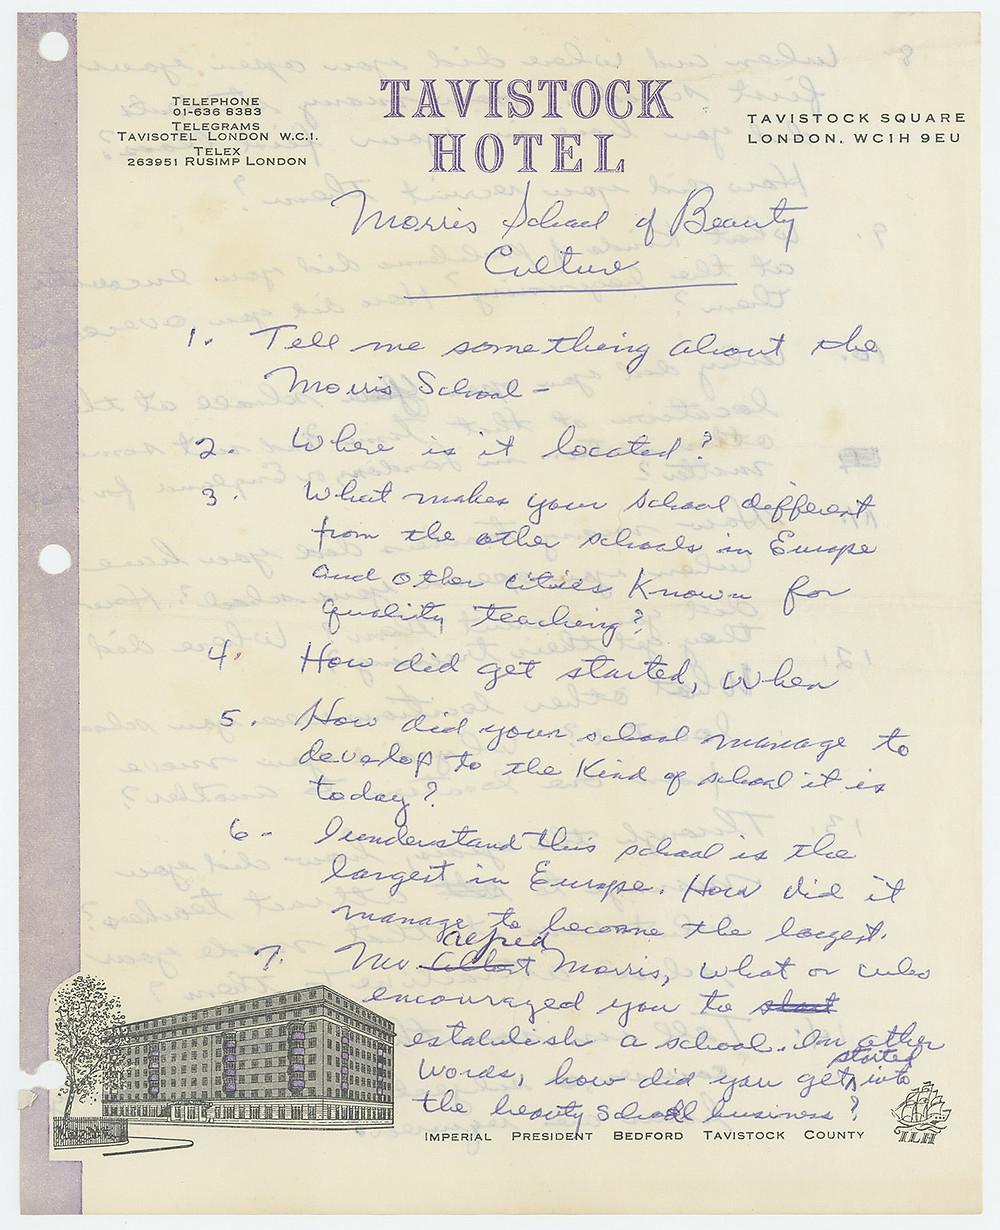 Arnold de Mille's interview notes taken on Tavistock Hotel stationery, 1974.